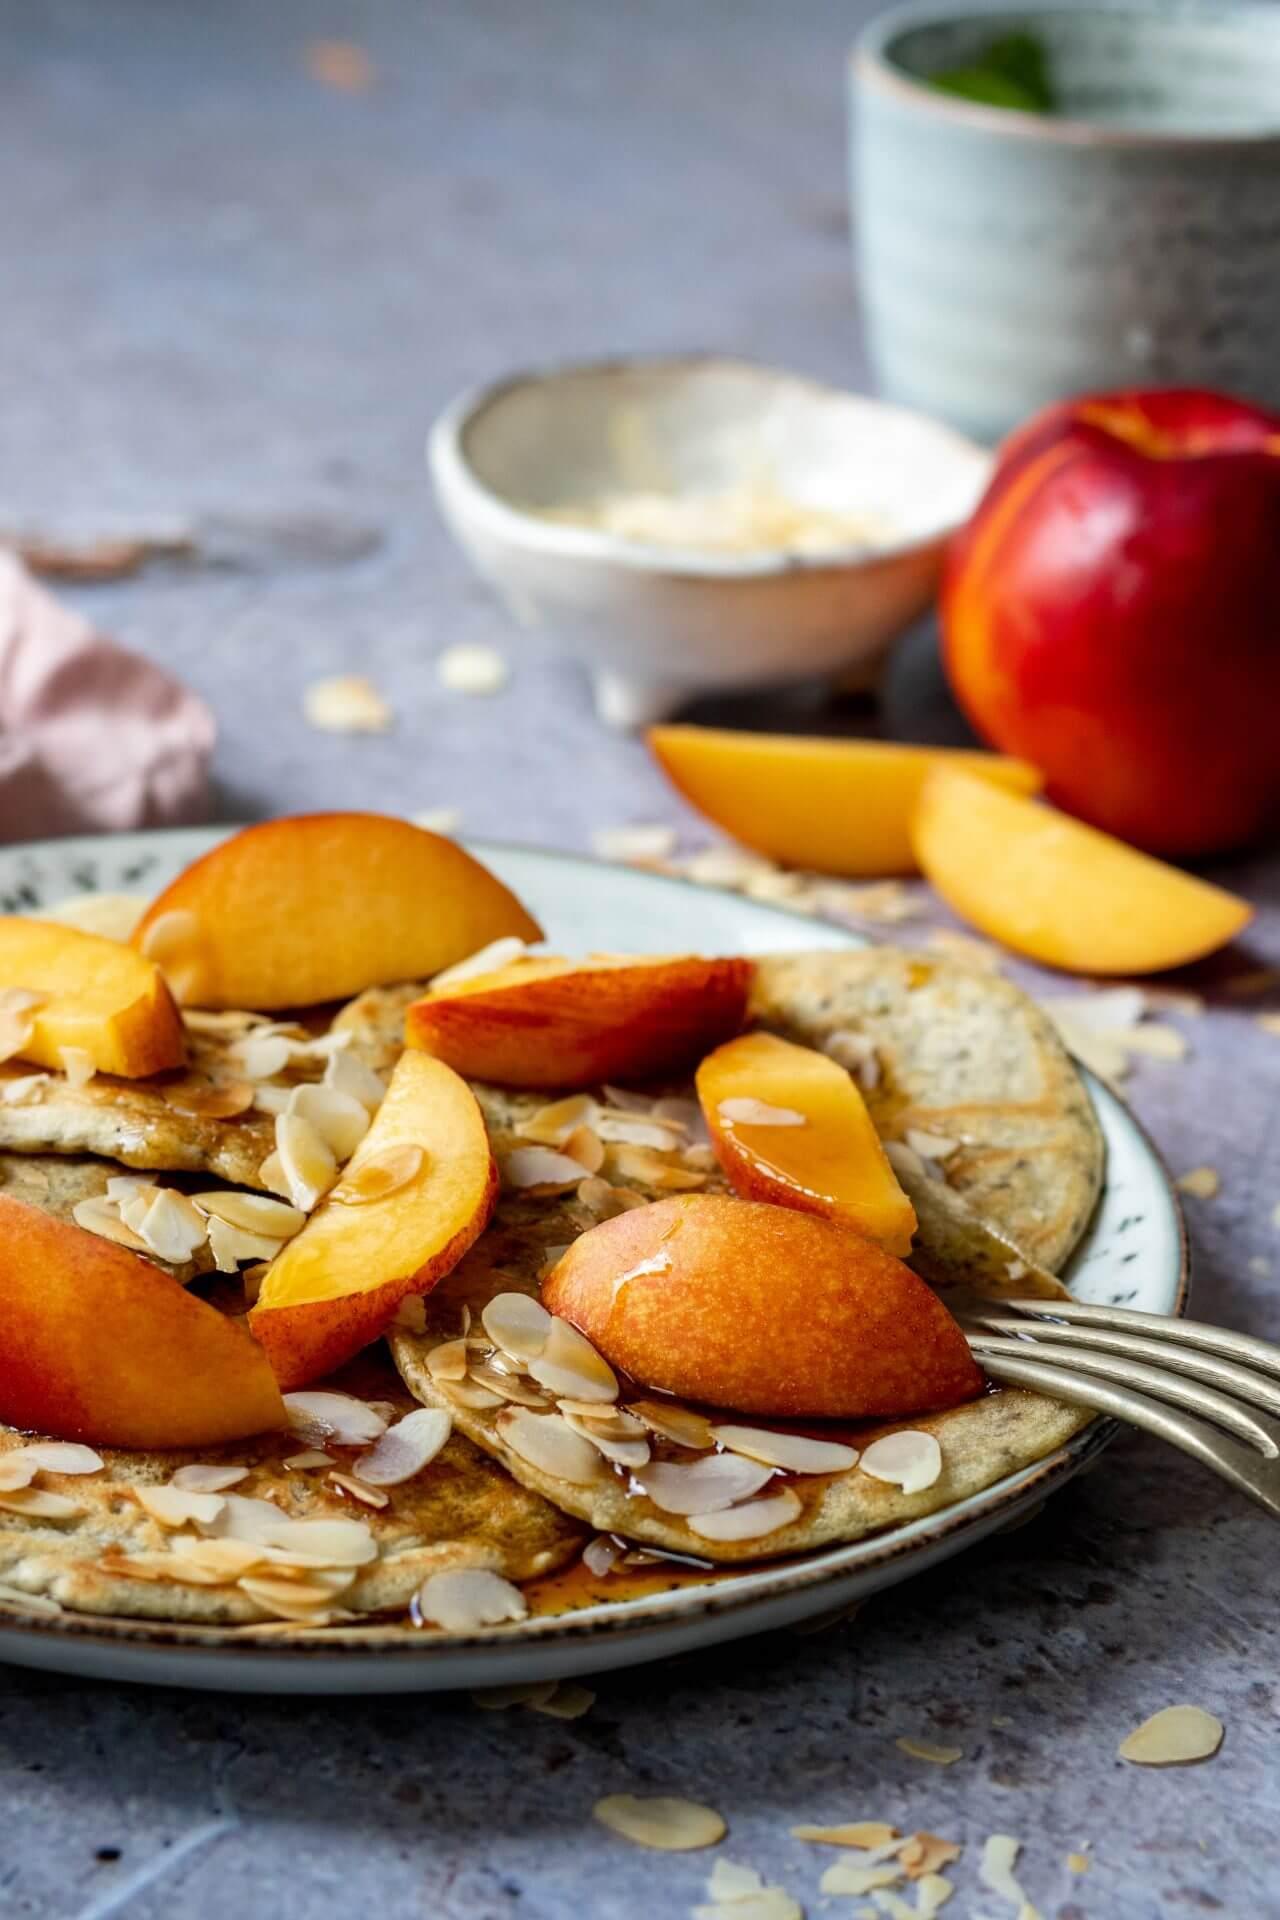 ontbijt-pannenkoekjes-met-nectarine